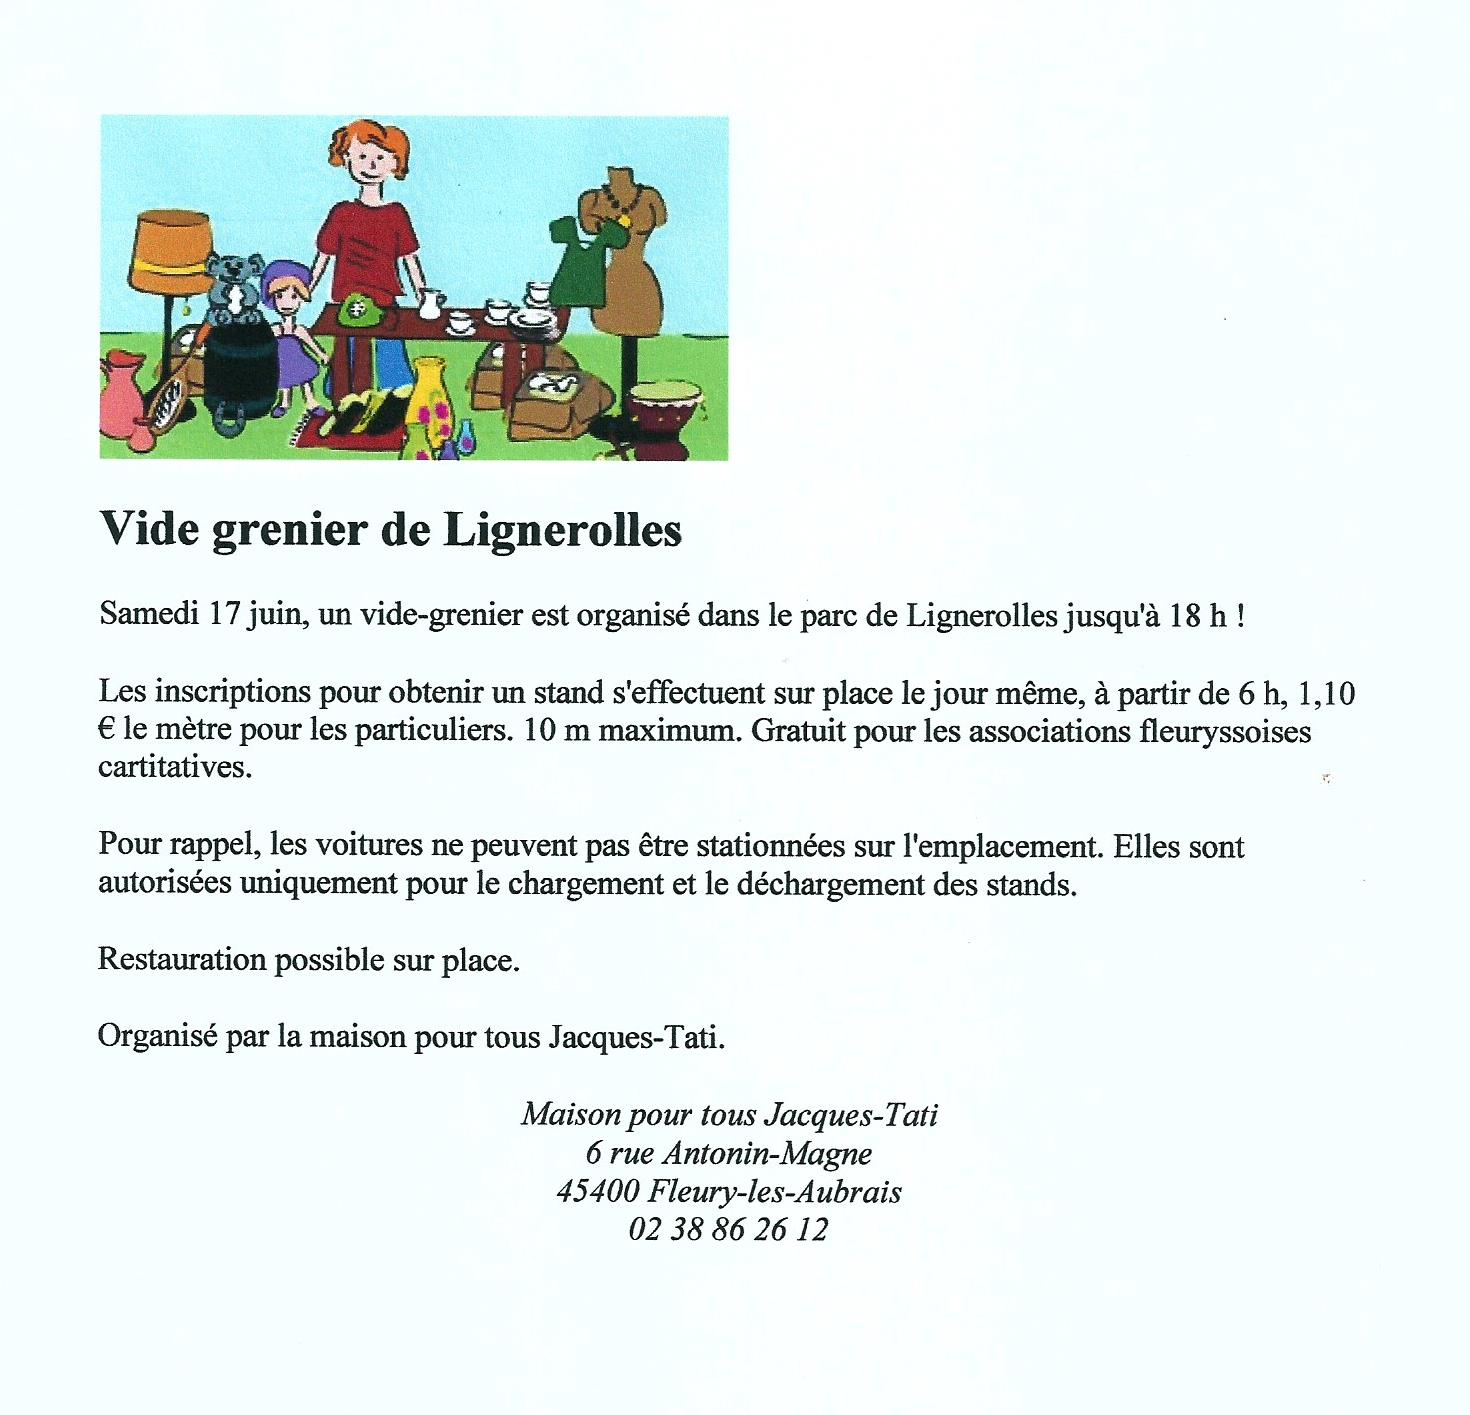 Scan Affiche vide grenier de Lignerolles 2017 ( 17.06.2017).jpg